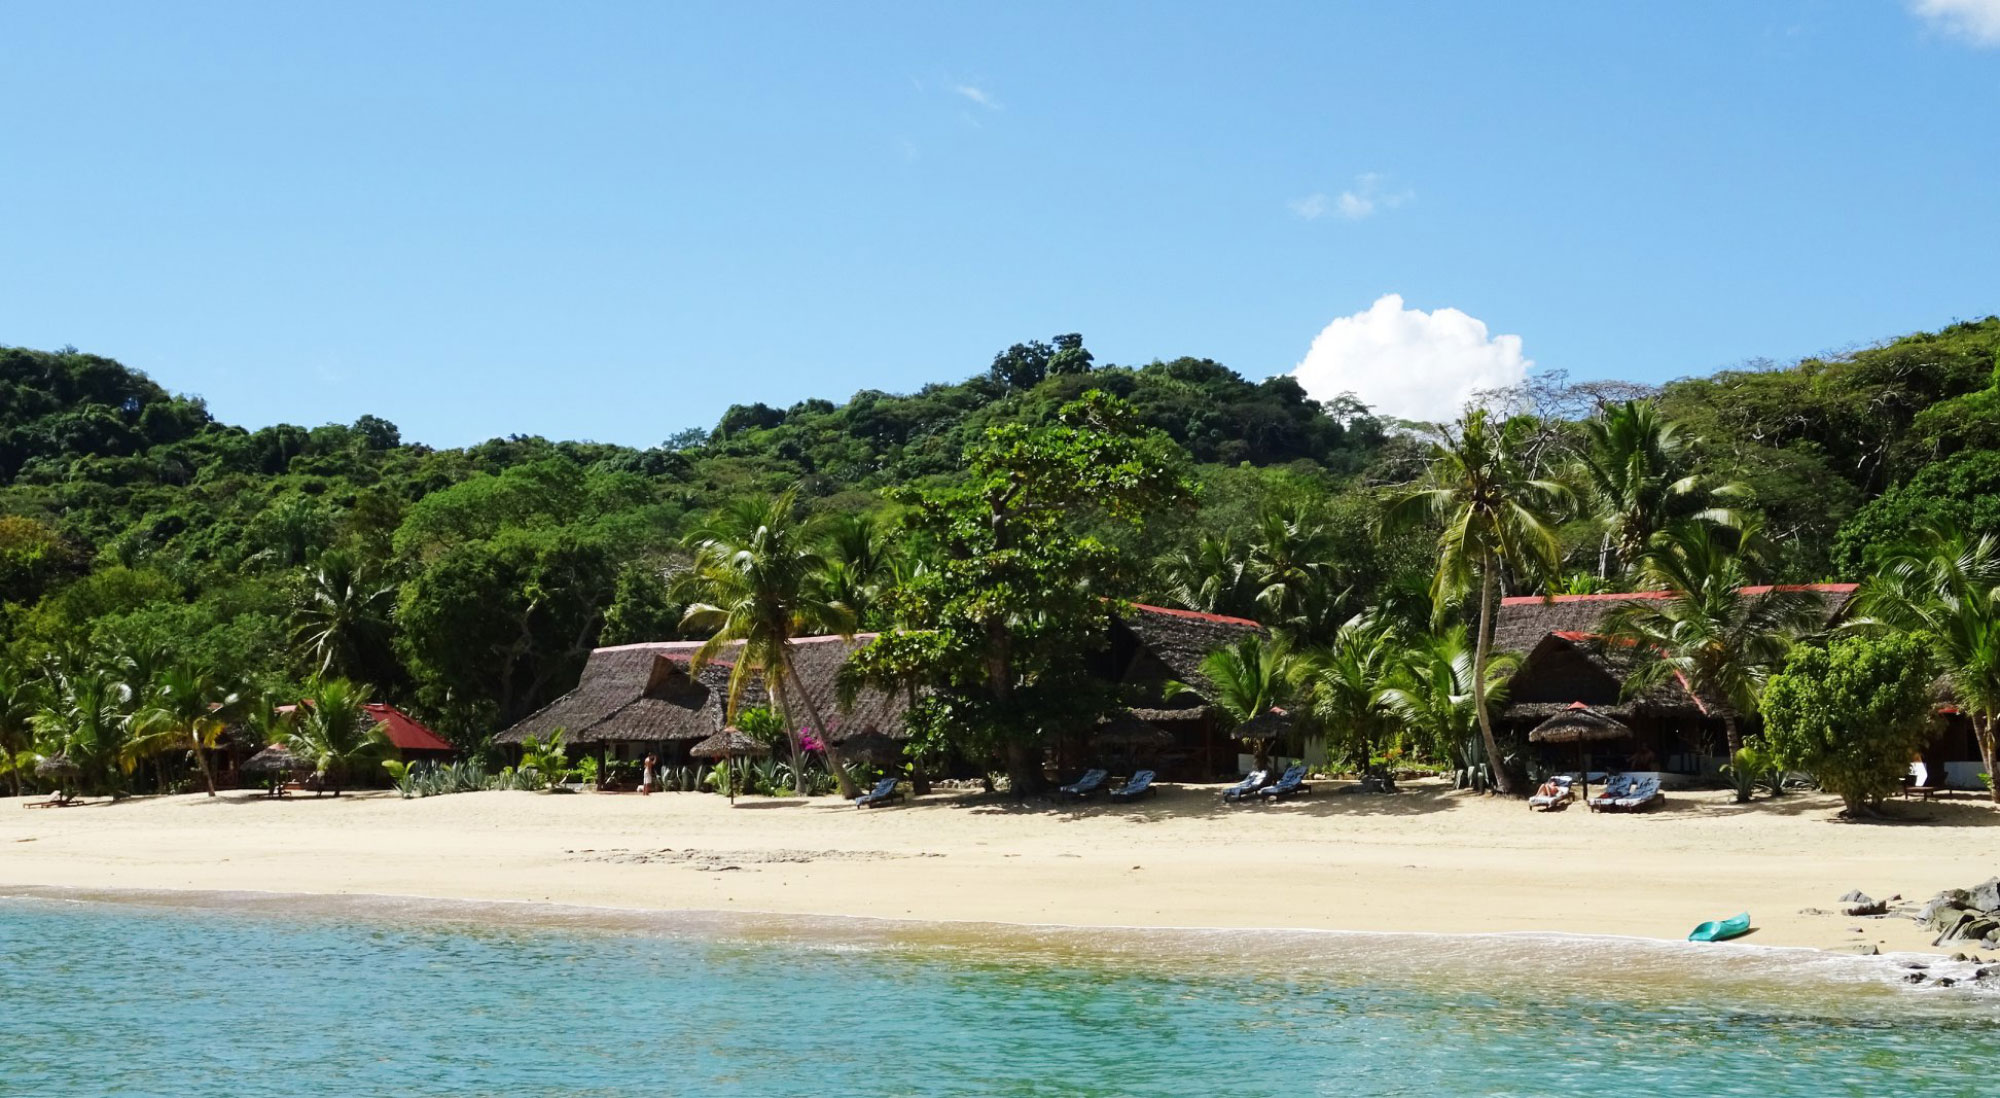 villaggi turistici in madagascar